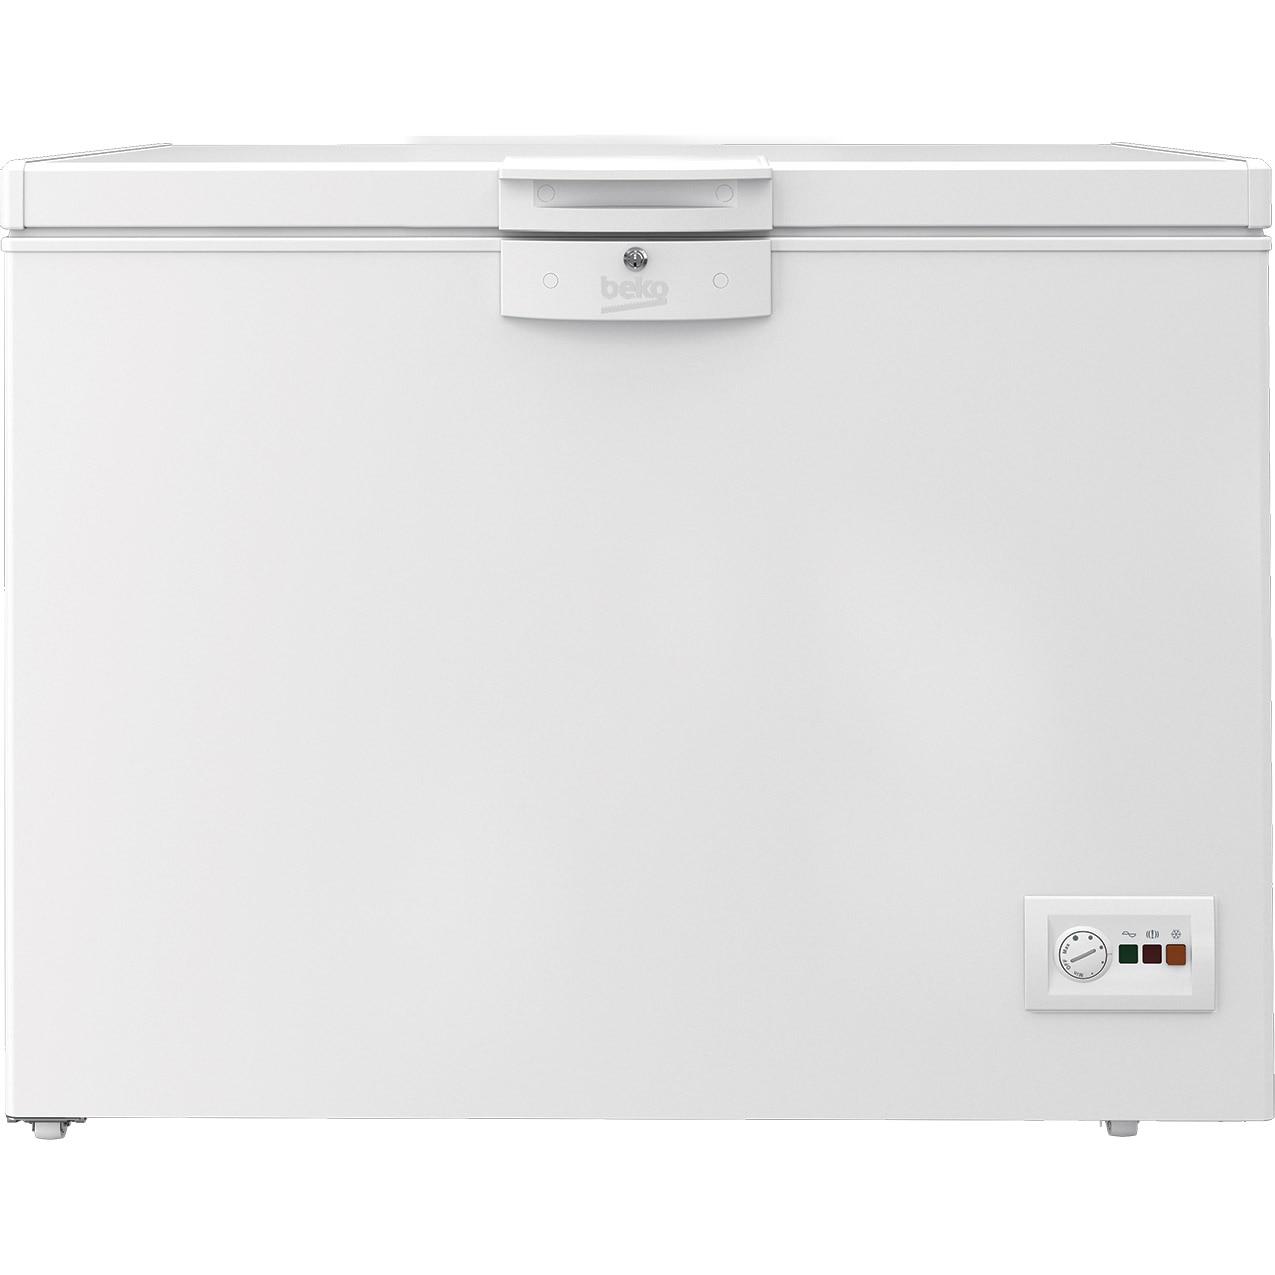 Fotografie Lada frigorifica Beko HSA24540N, 230 l, Clasa A++, Securizare yala, Congelare rapida, Iluminare LED, Alb